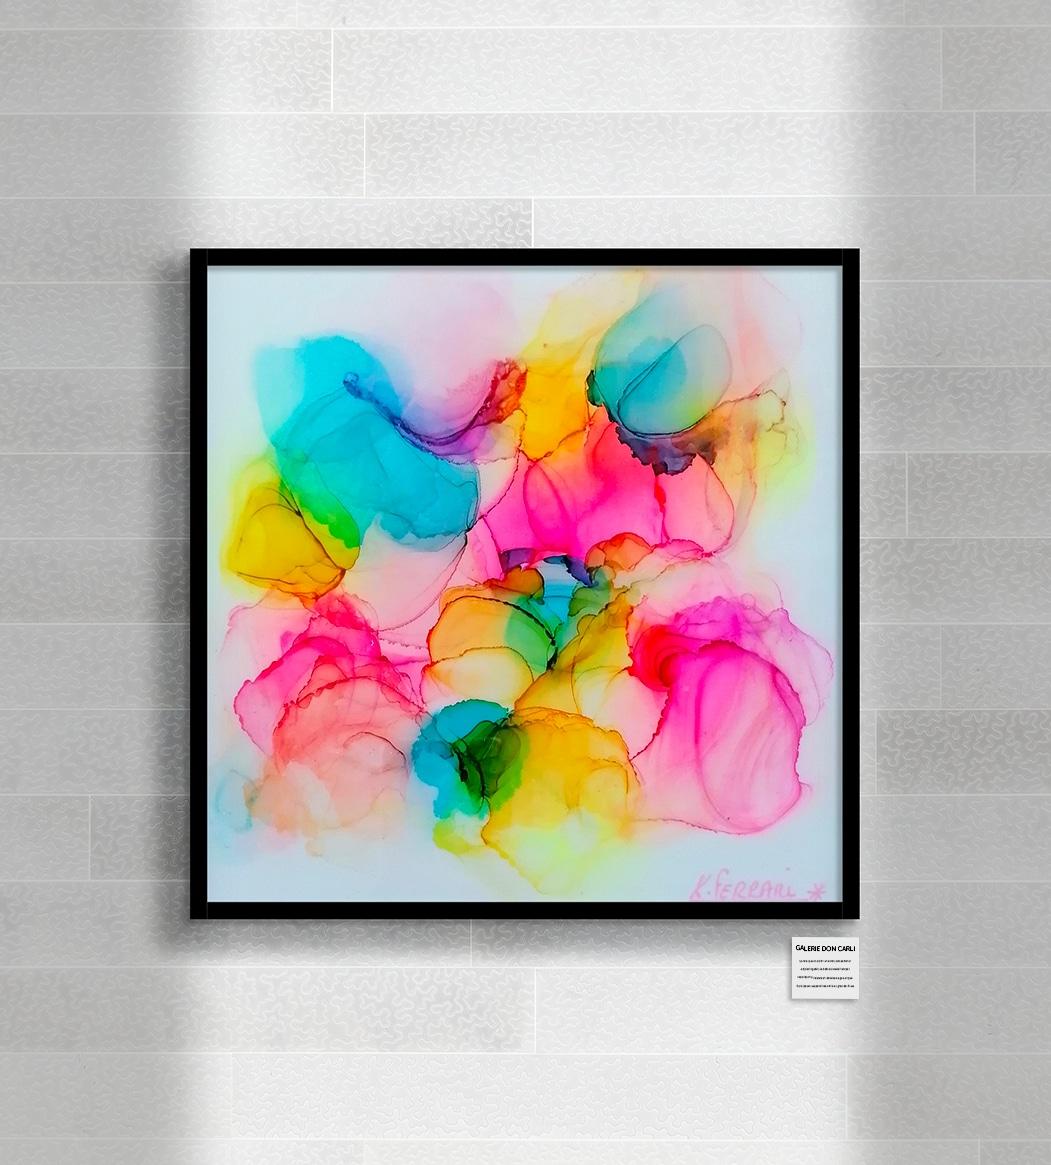 circle-color-katia-ferrari-don-carli-lyon